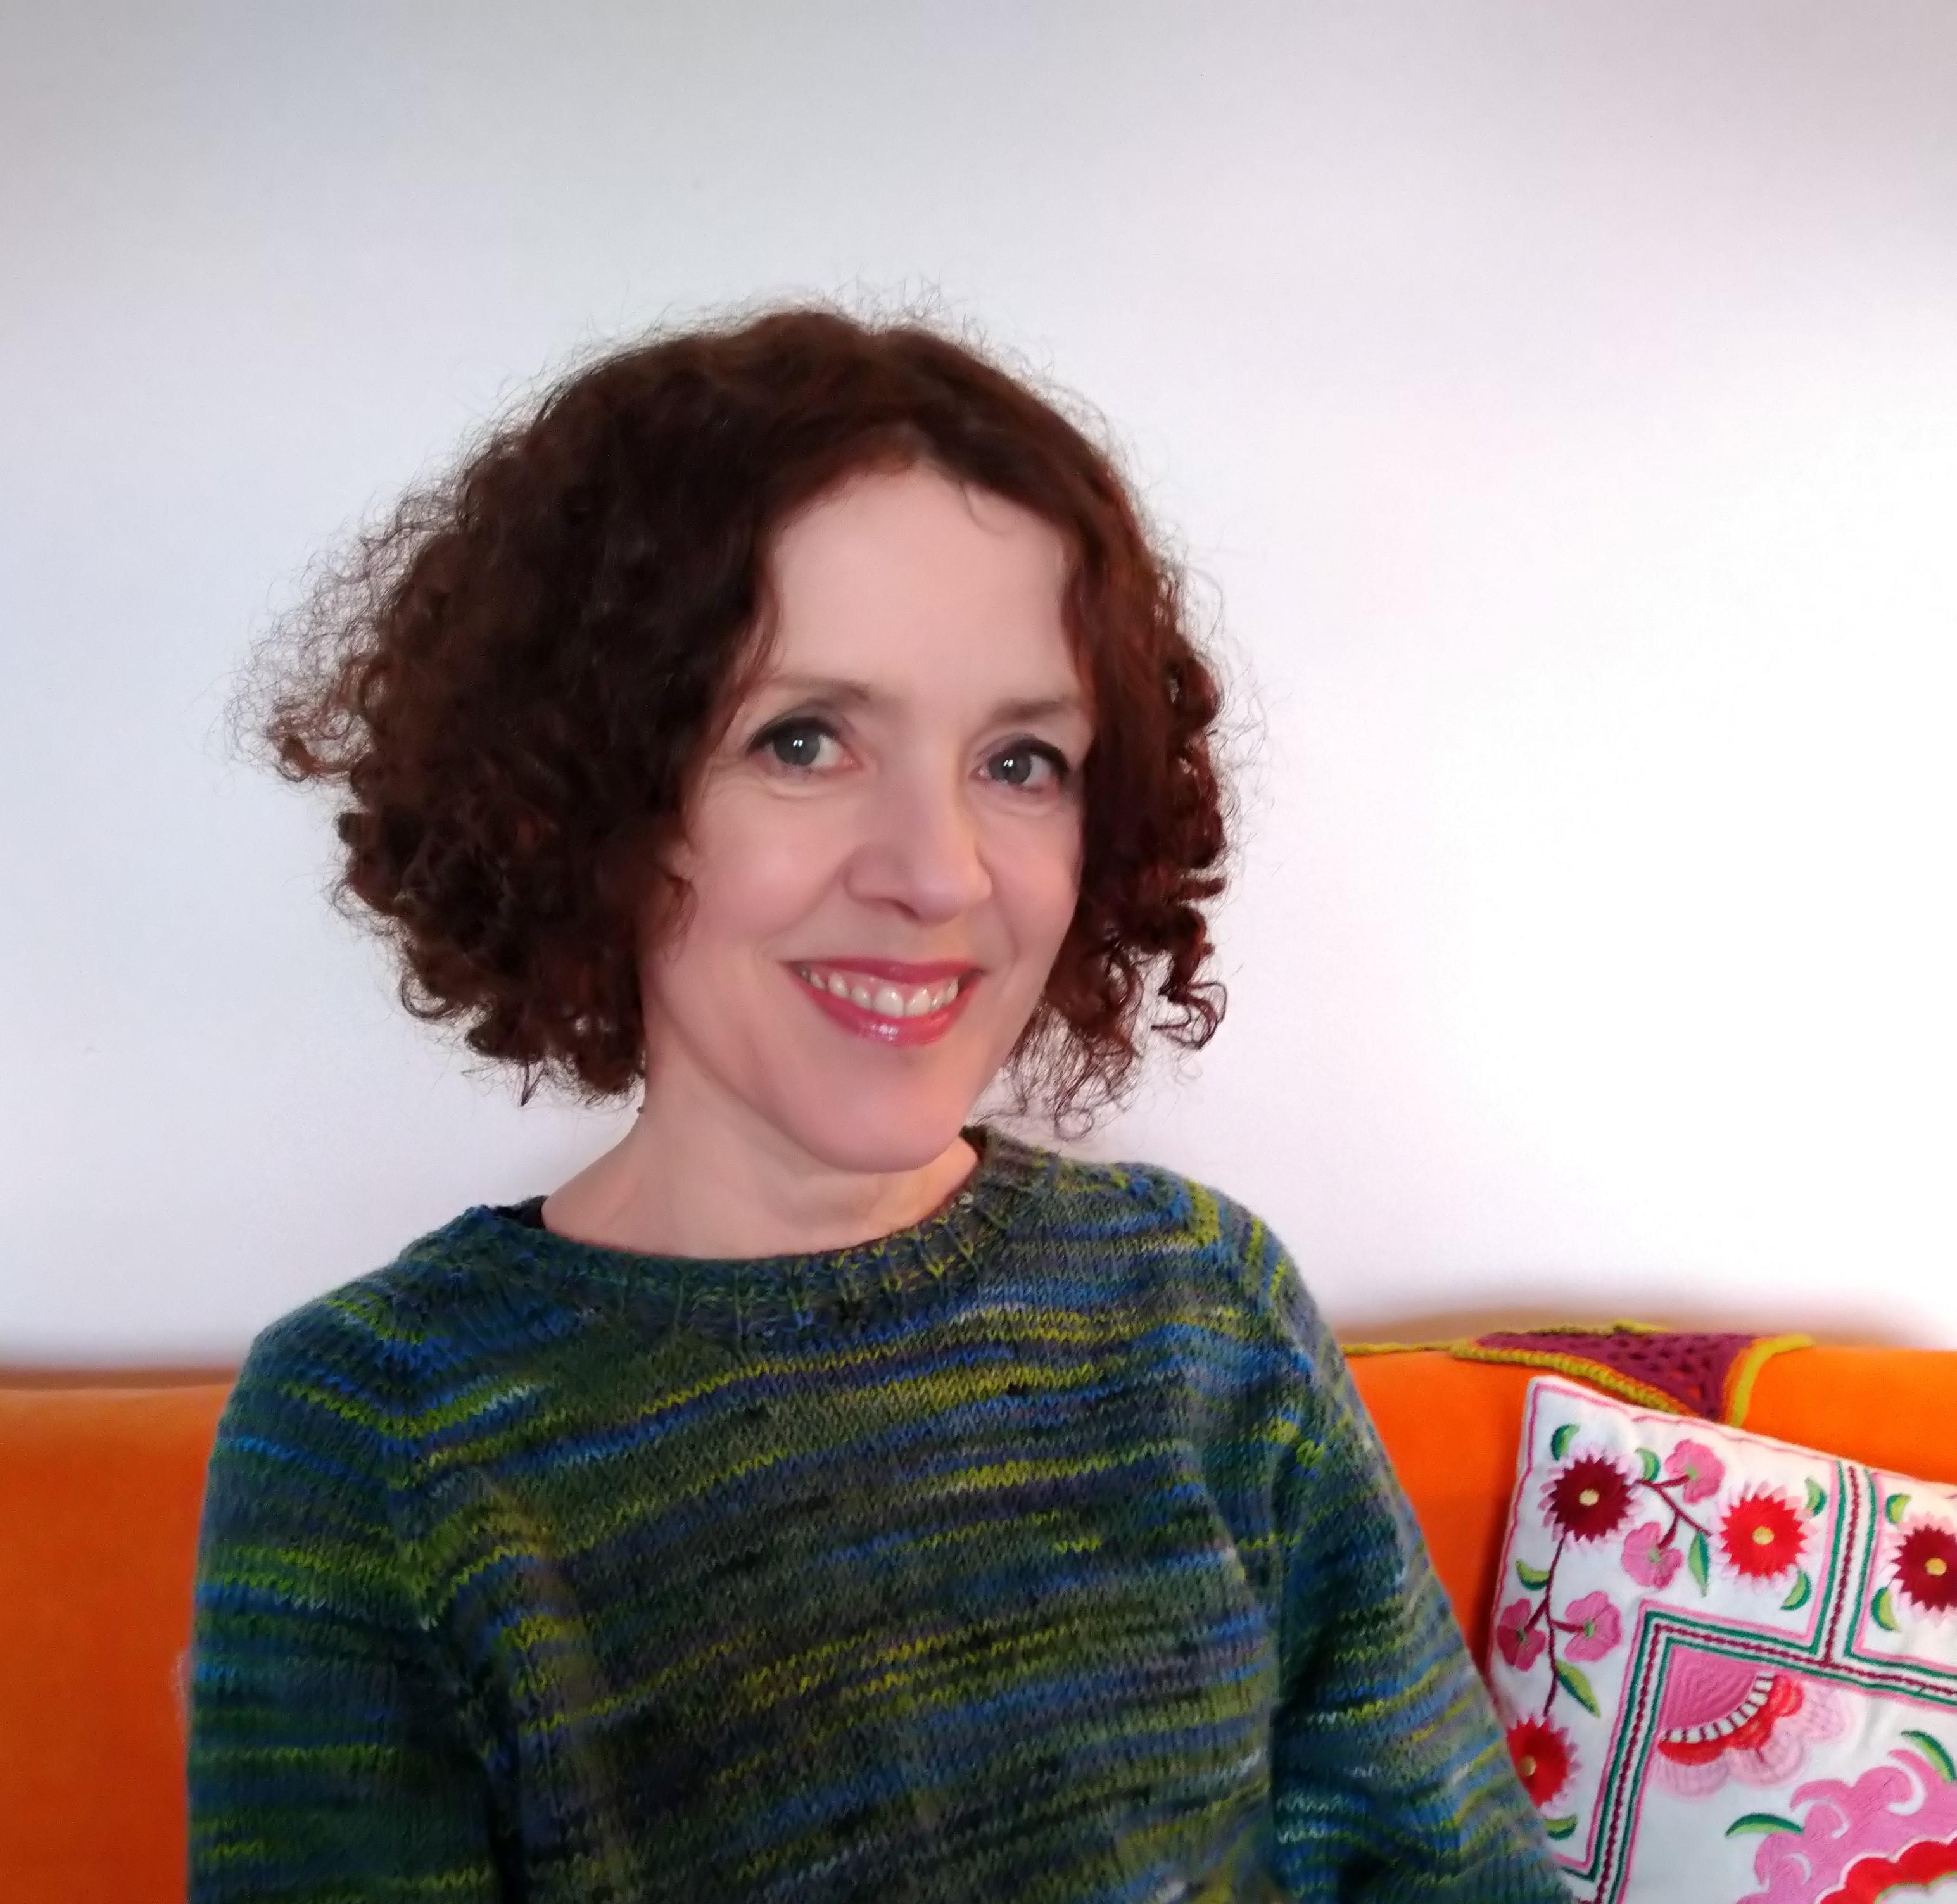 Laura Bosworth